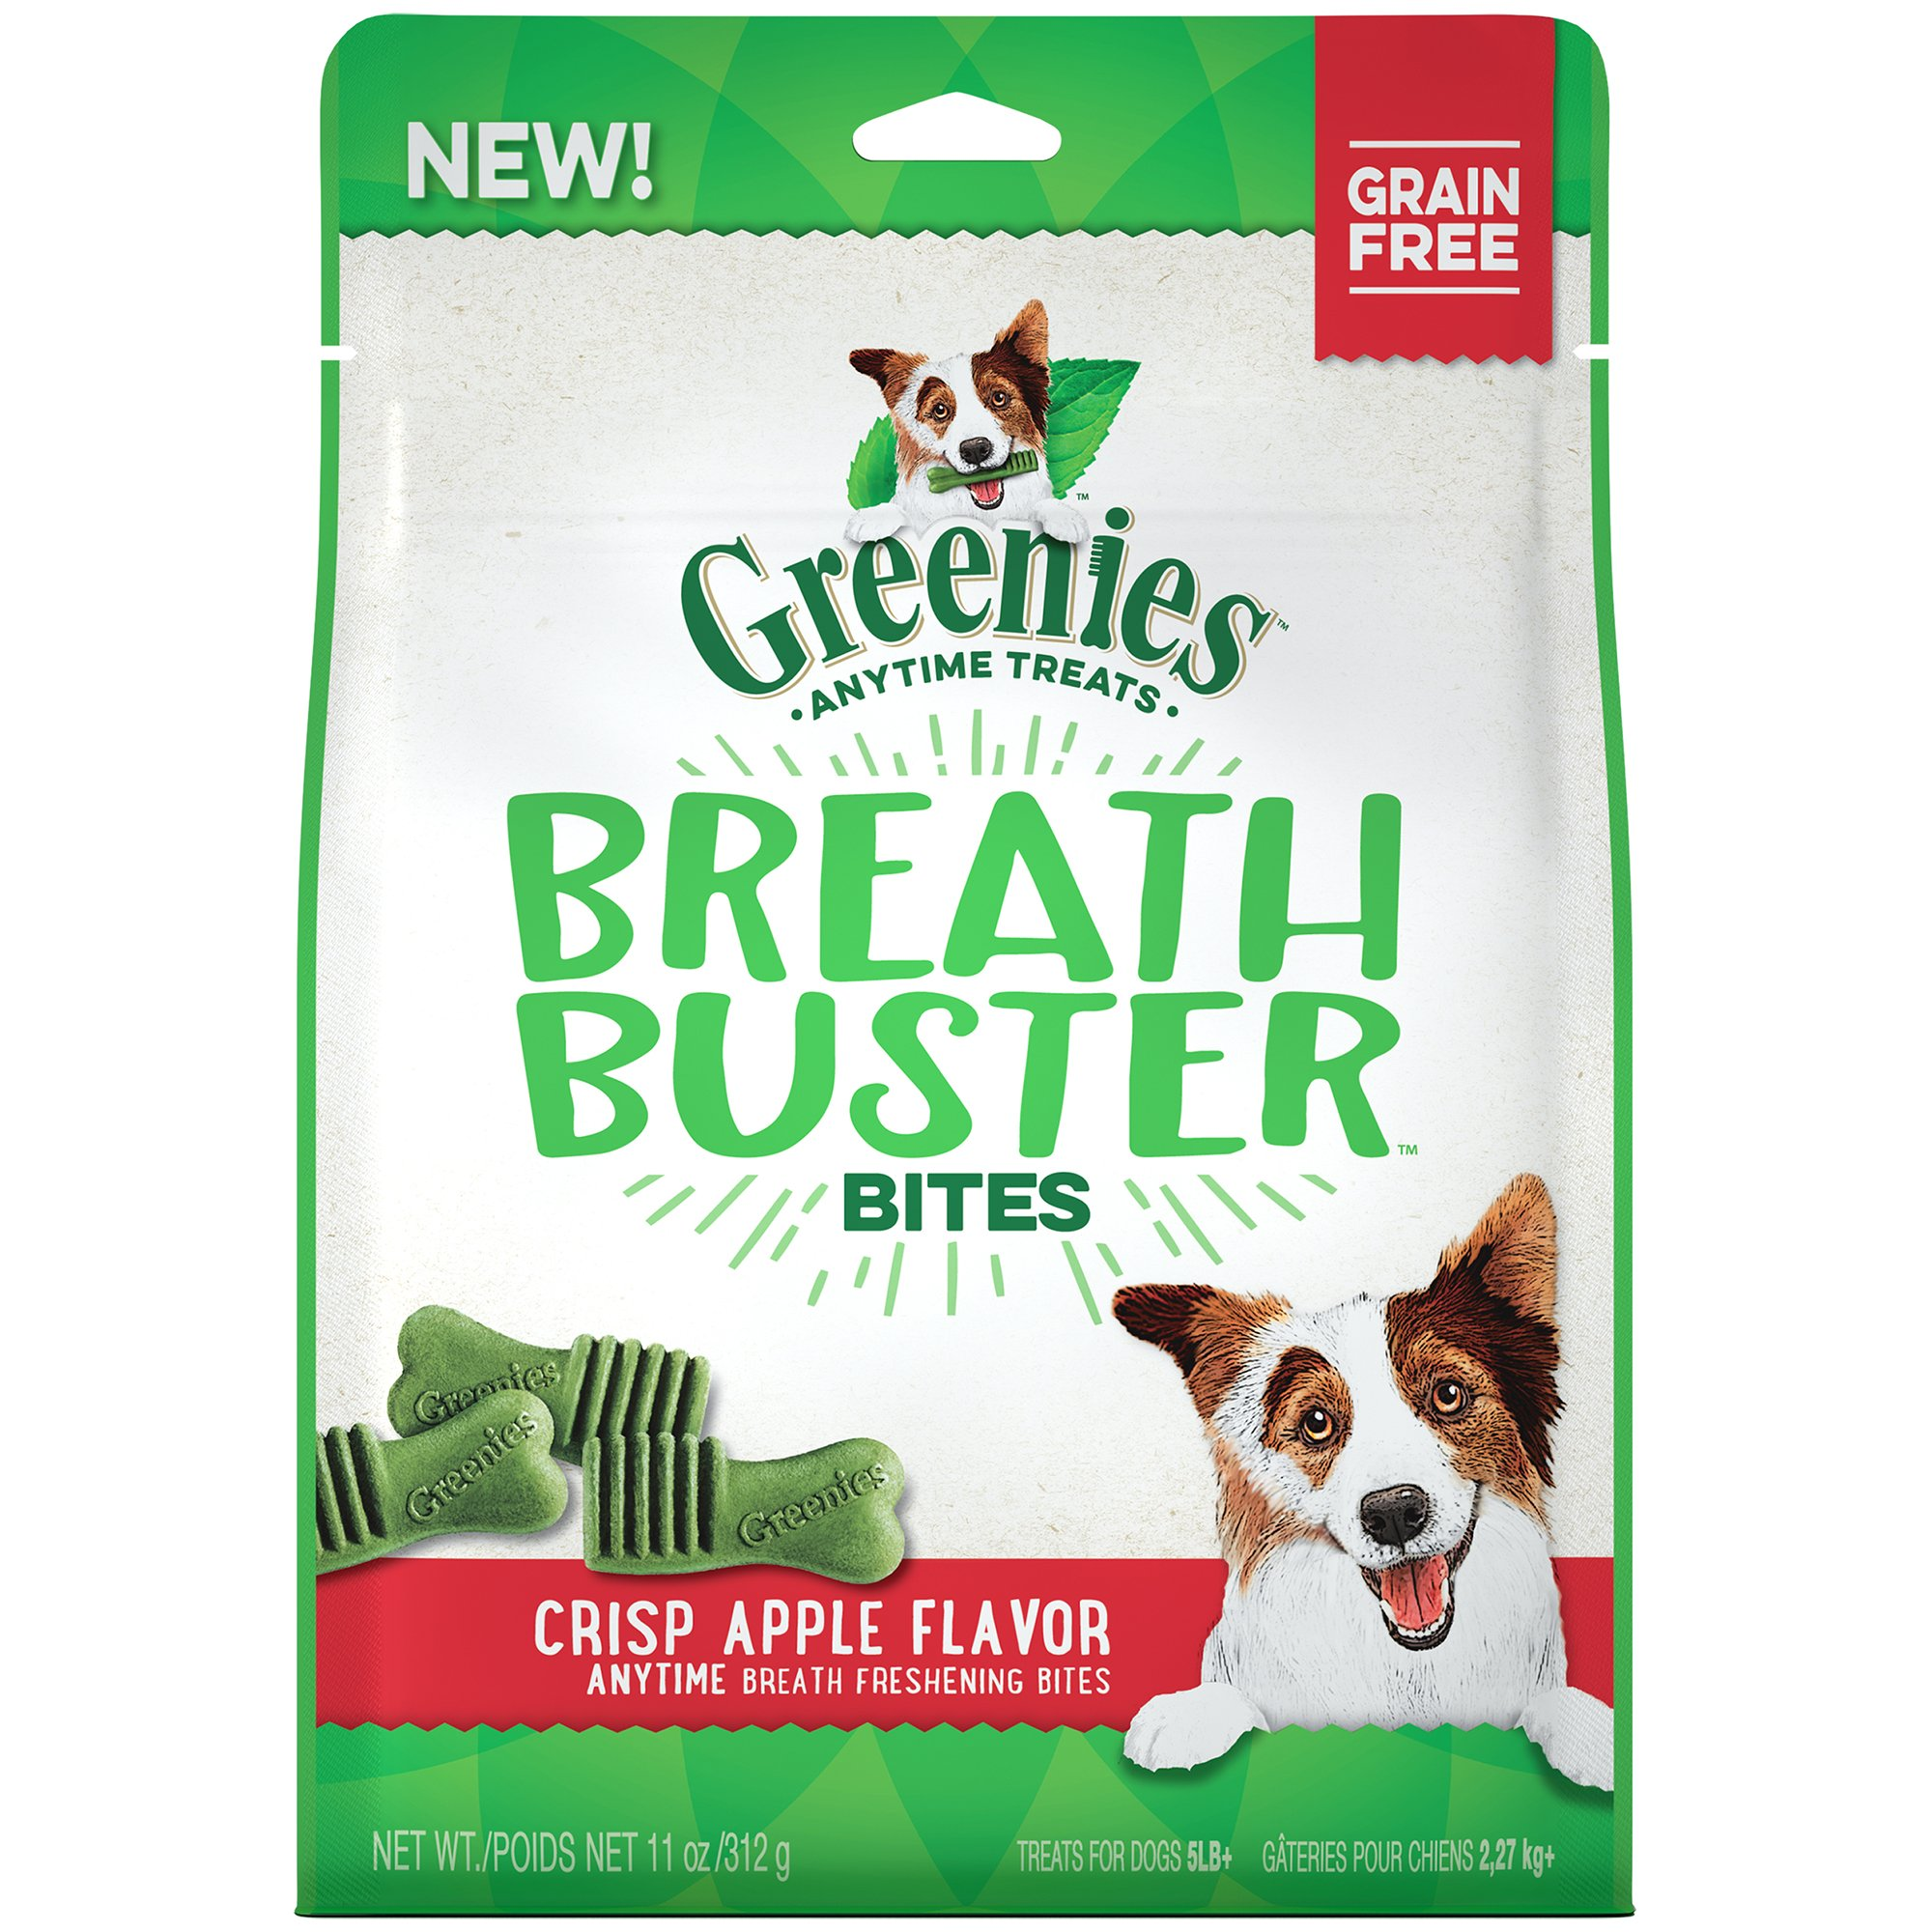 GREENIES BREATH BUSTER Bites Crisp Apple Flavor Treats for Dogs 11 Ounces